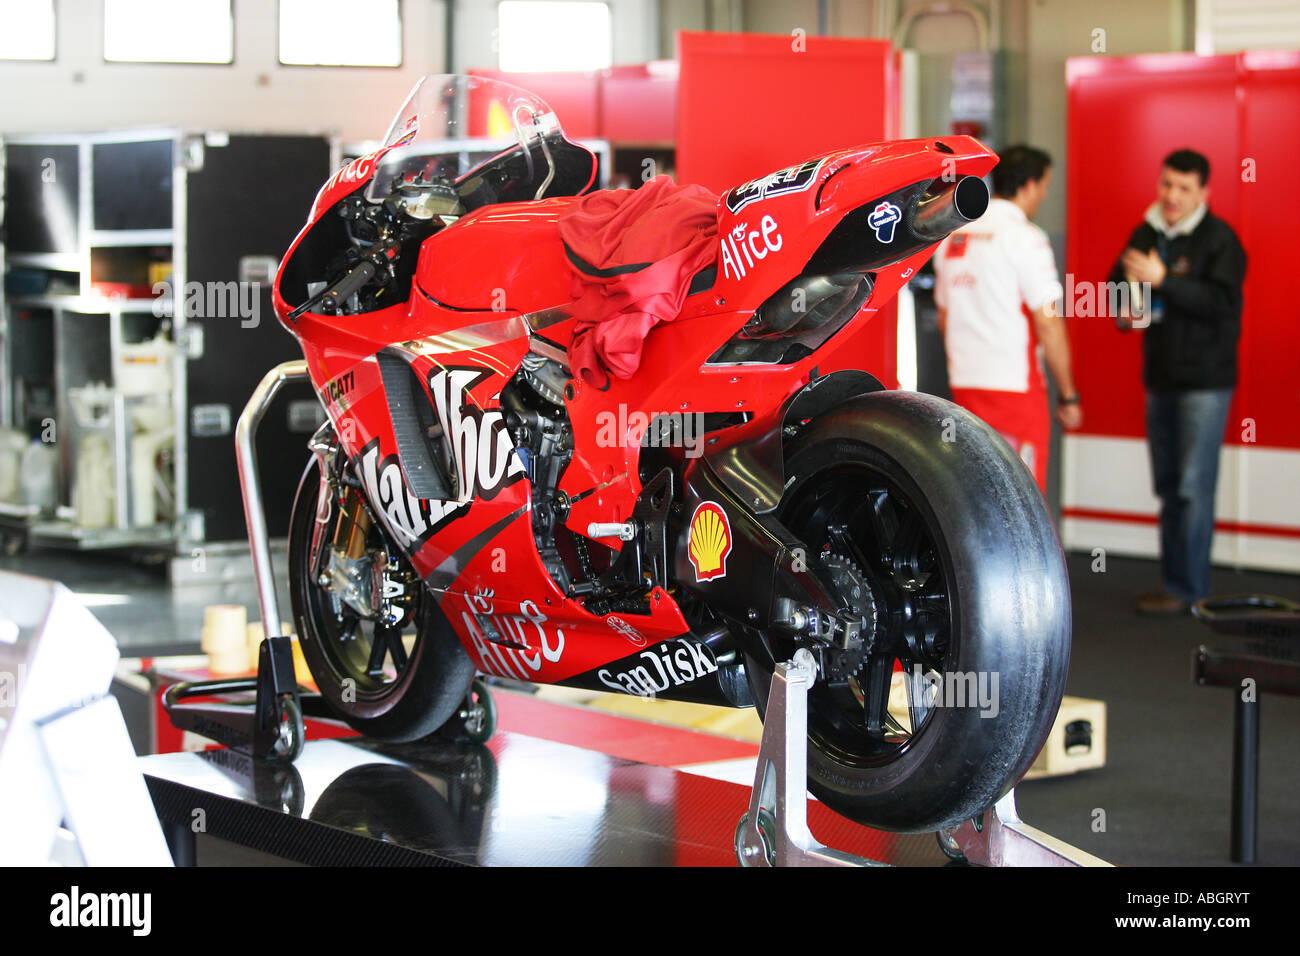 ducati 2007 moto gp bike - Stock Image